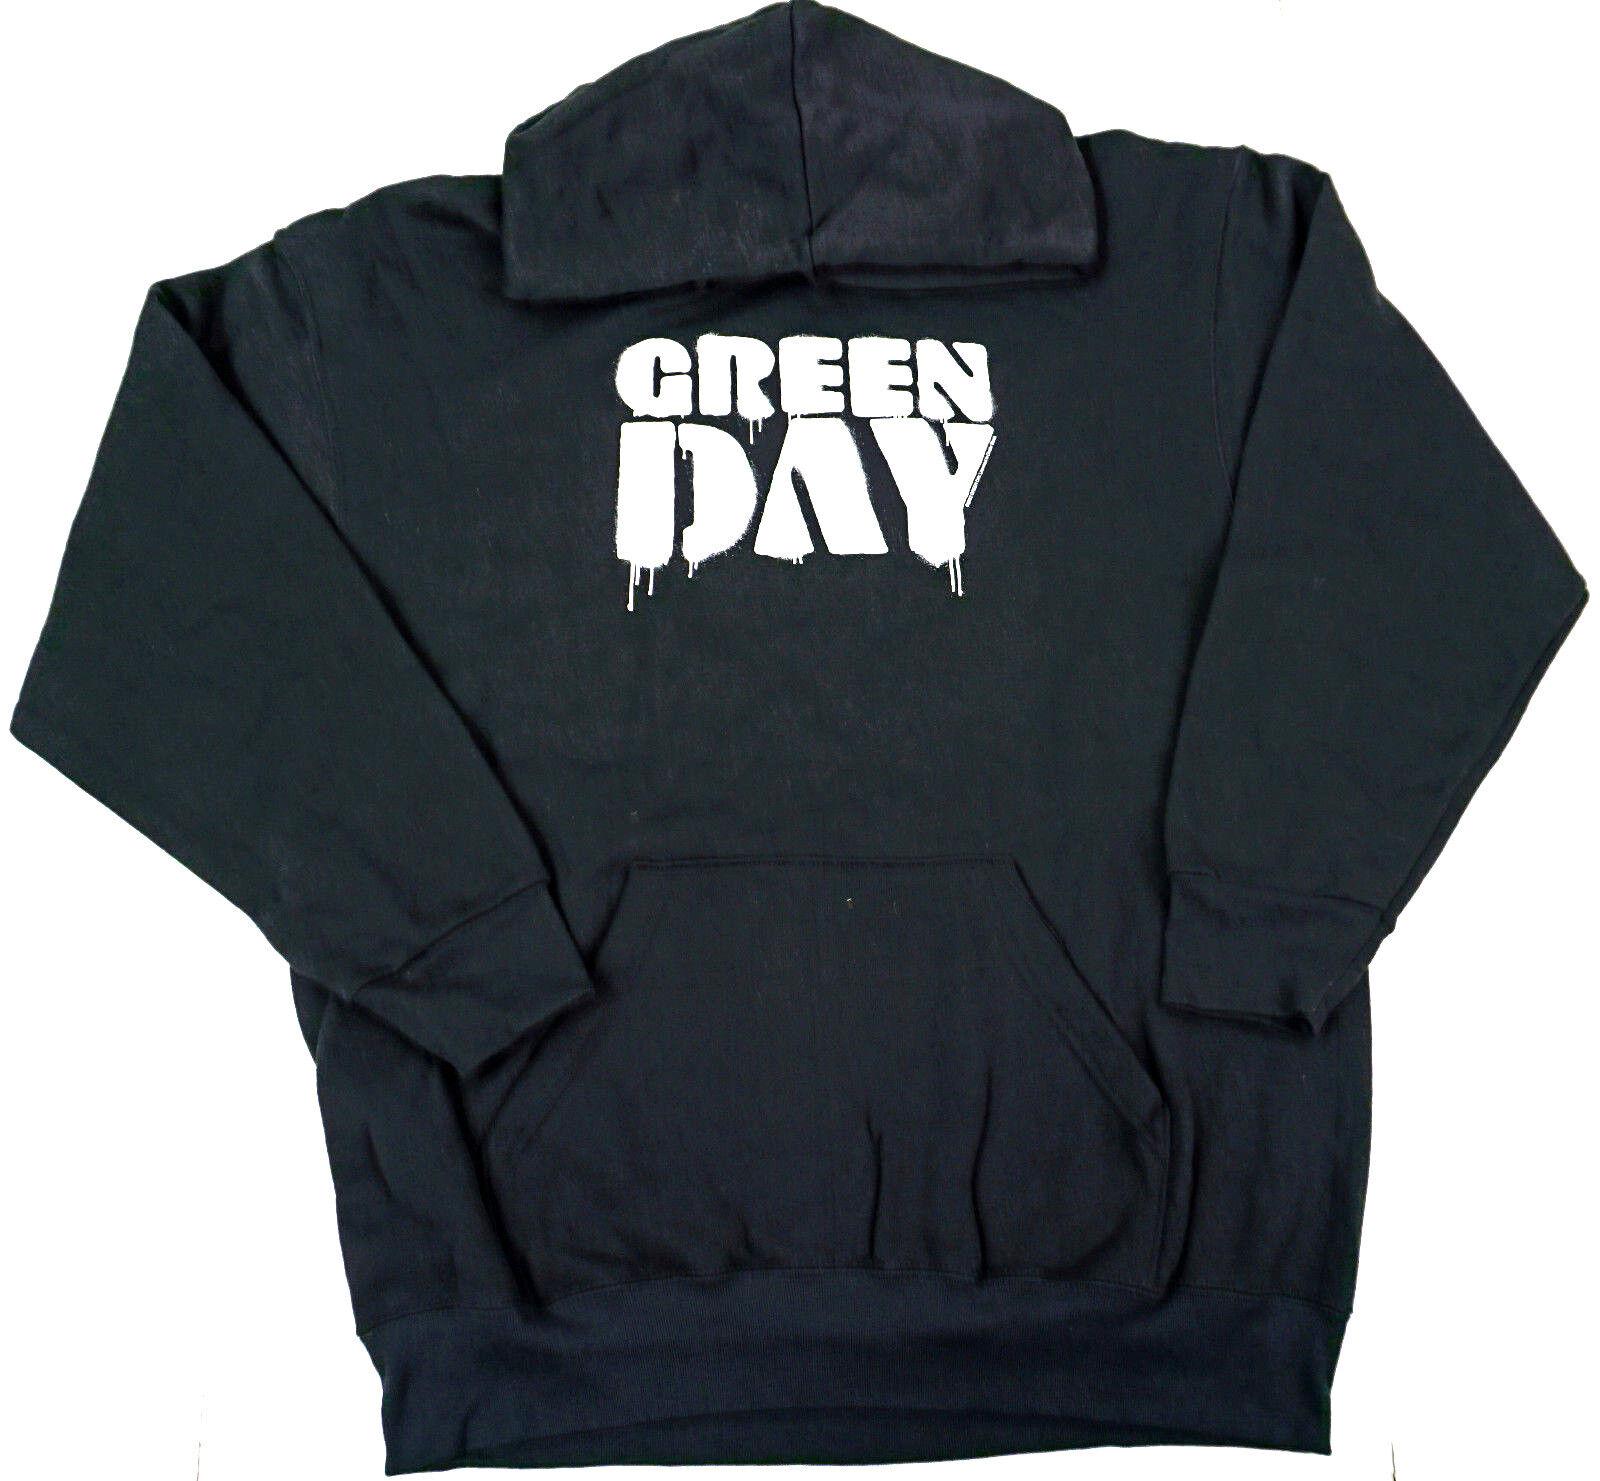 GREEN DAY Pullover Hoodie Sweatshirt Hoody Adult XL New Men